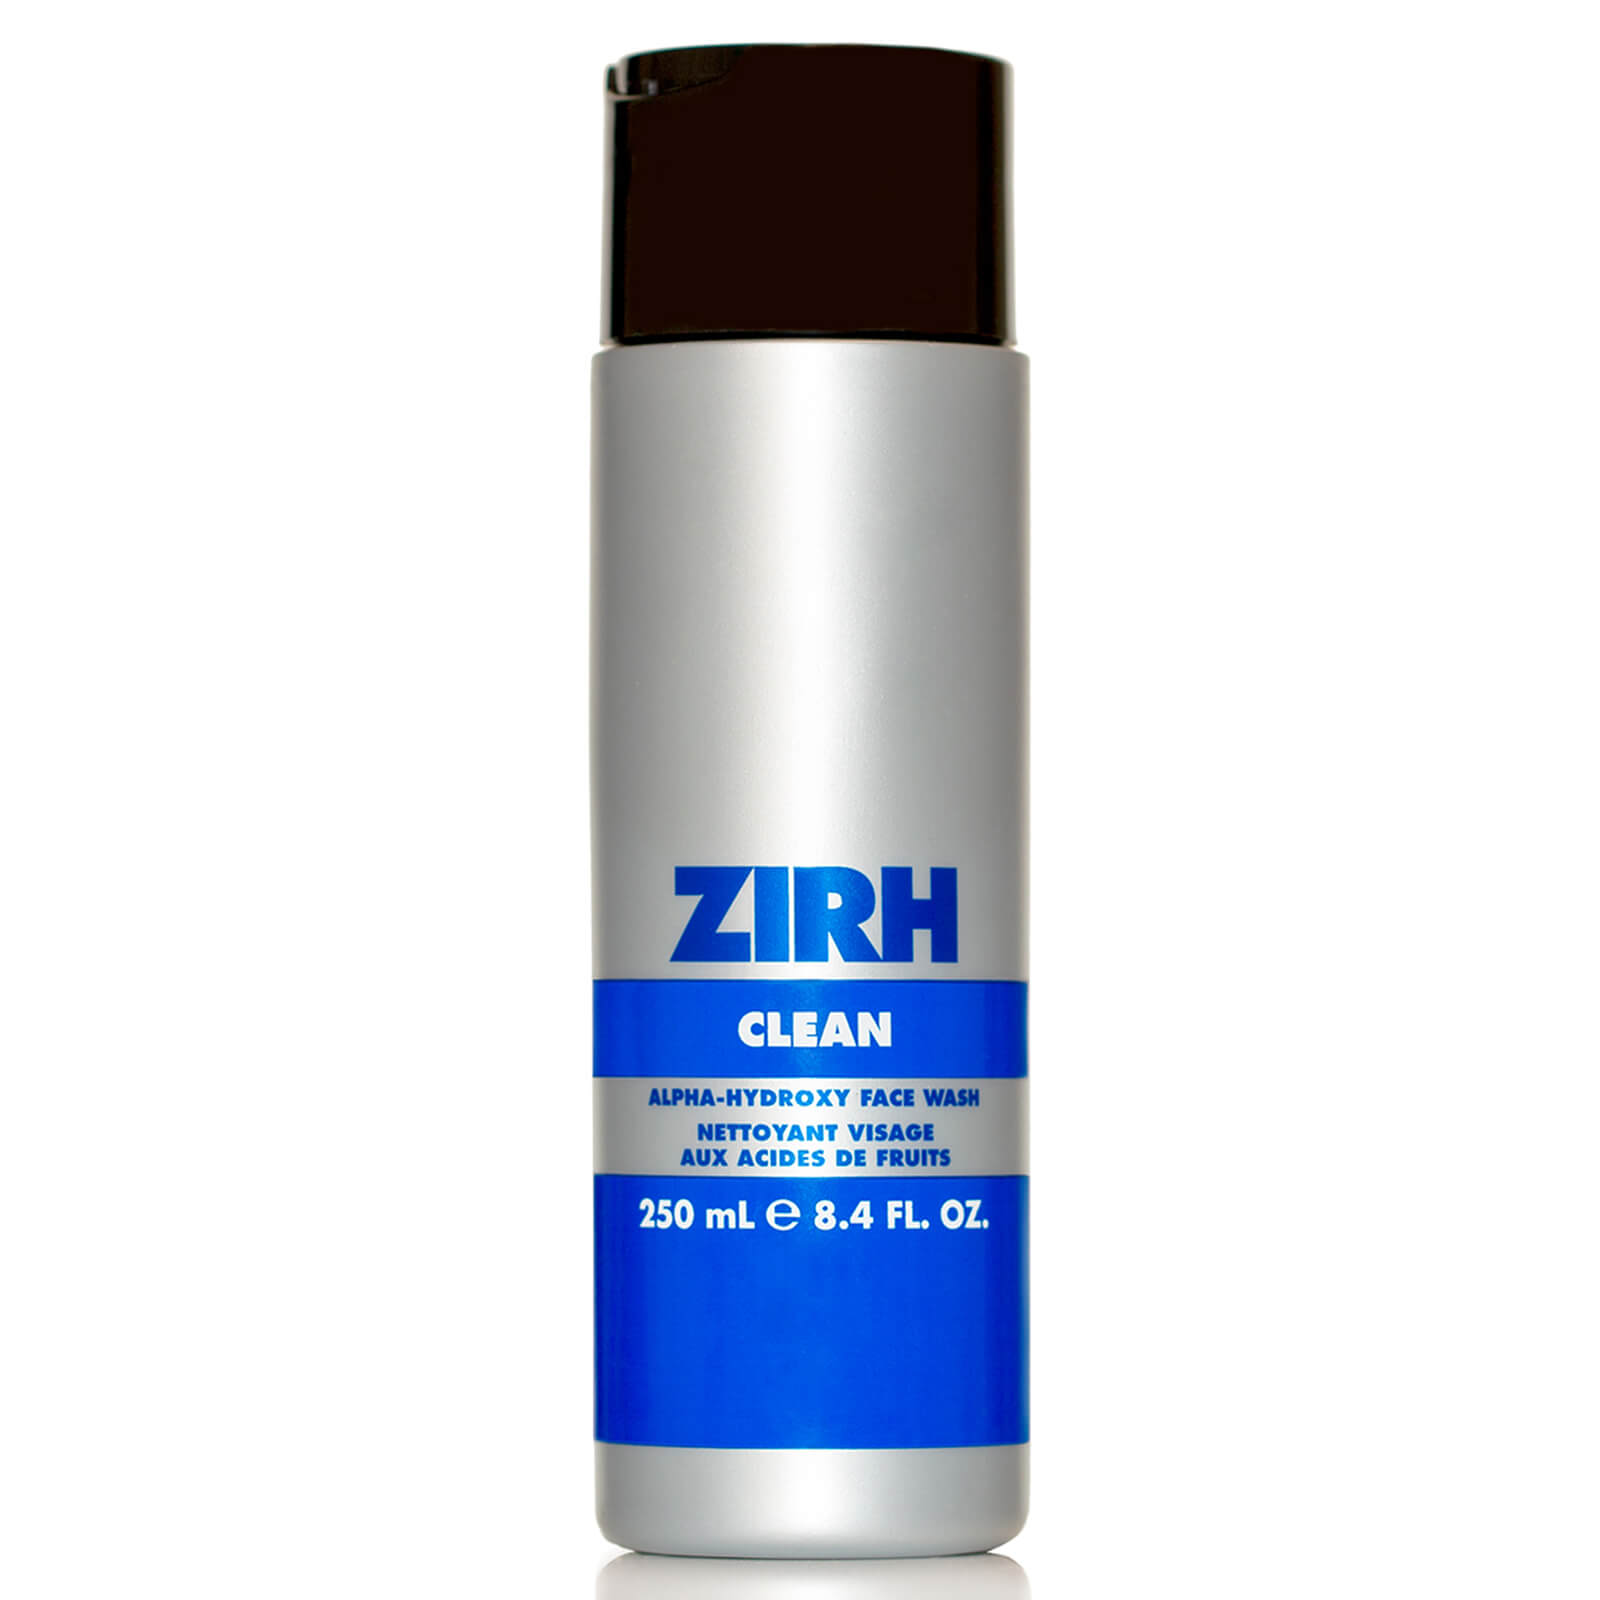 Купить Zirh Alpha-Hydroxy Face Wash 250ml